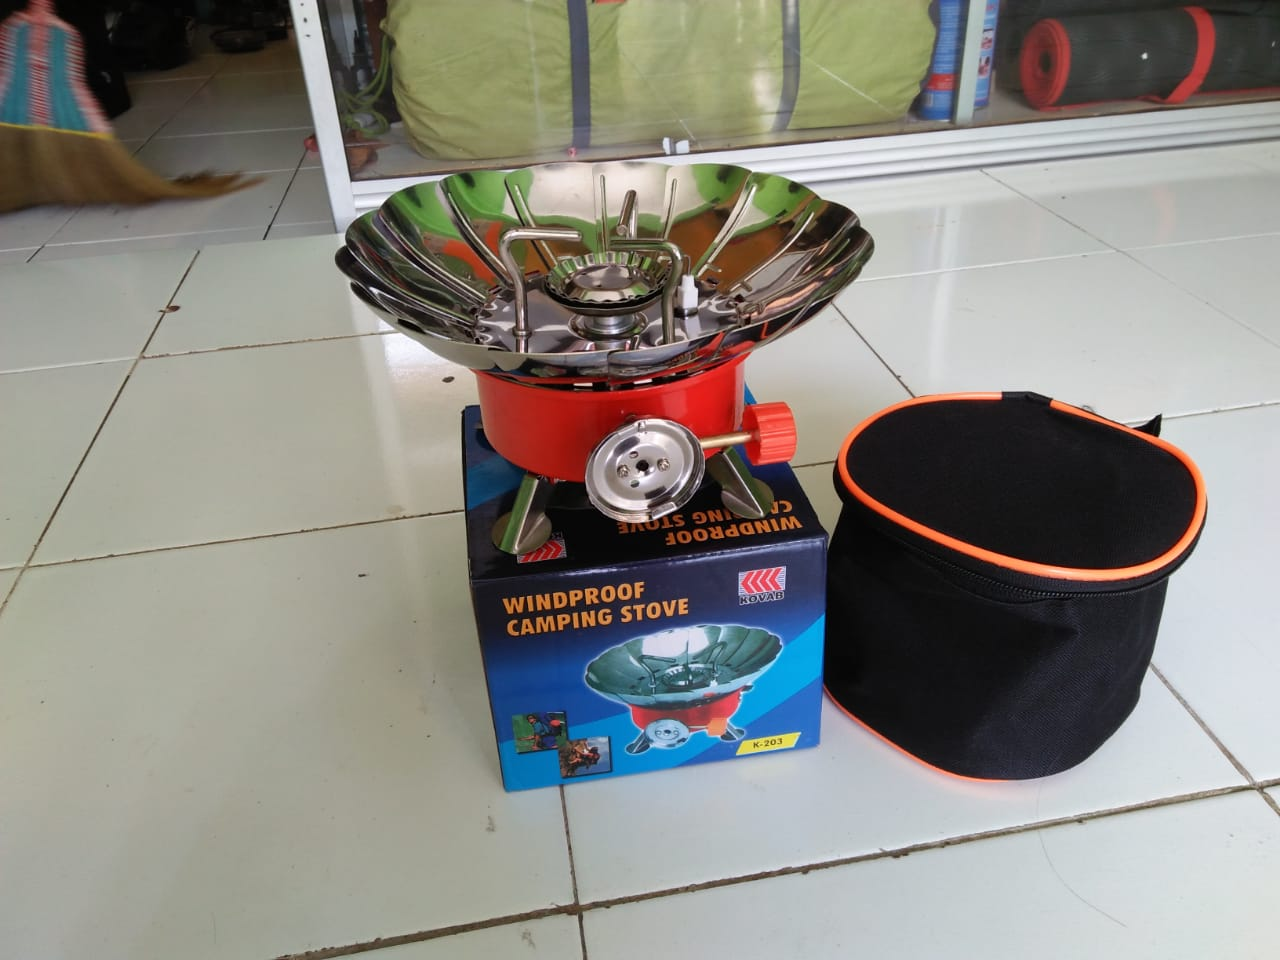 Jual Kompor Portable Windproof Murah Krakatau Jogja Mini Stove Lapang